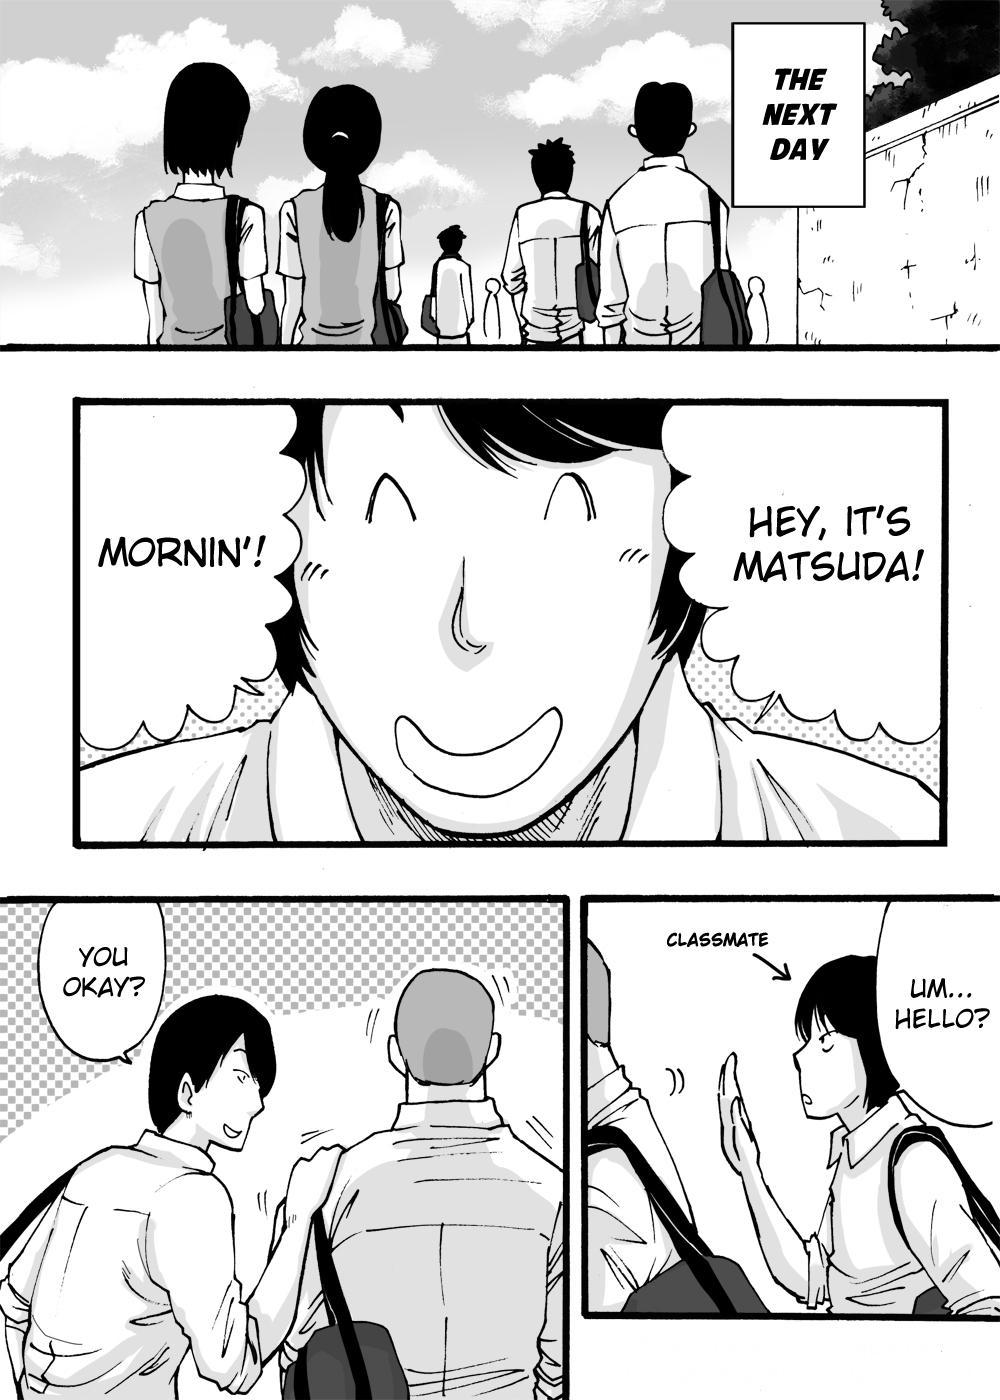 [Akahachi] Motemote Yakyuubu Otoko [Kouhen] | Popular Baseball Club Boys (Part Two) [English] [Papatez] 45